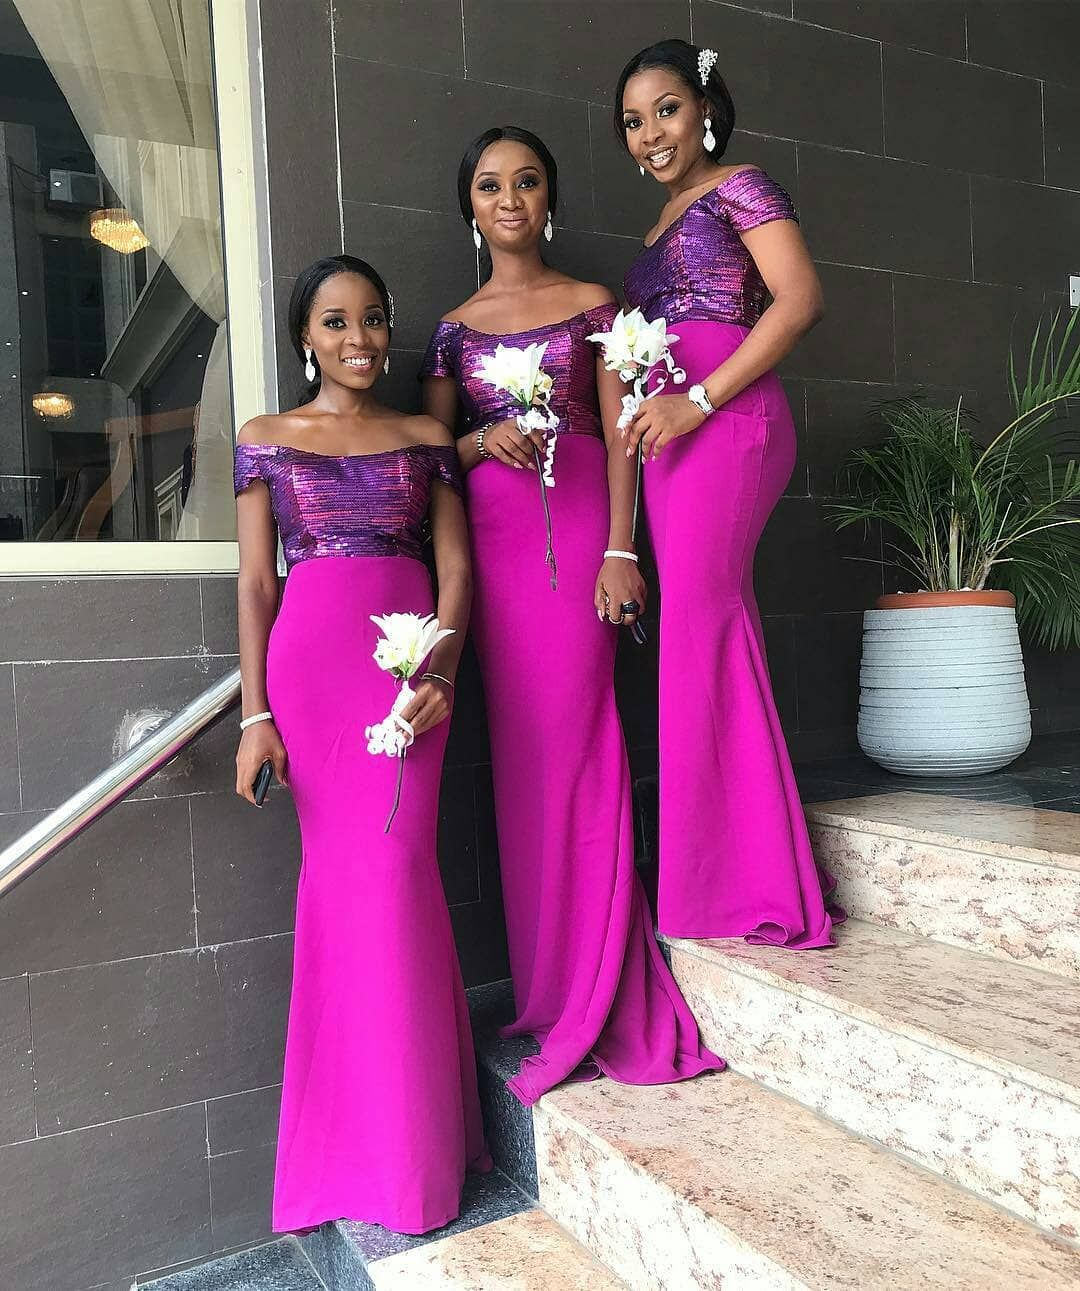 Brides Maids Fot Oba17 Photo Perkymakeovers Ebweddings African Bridesmaid Dresses Nigerian Bridesmaid Dresses Bridal Bridesmaid Dresses